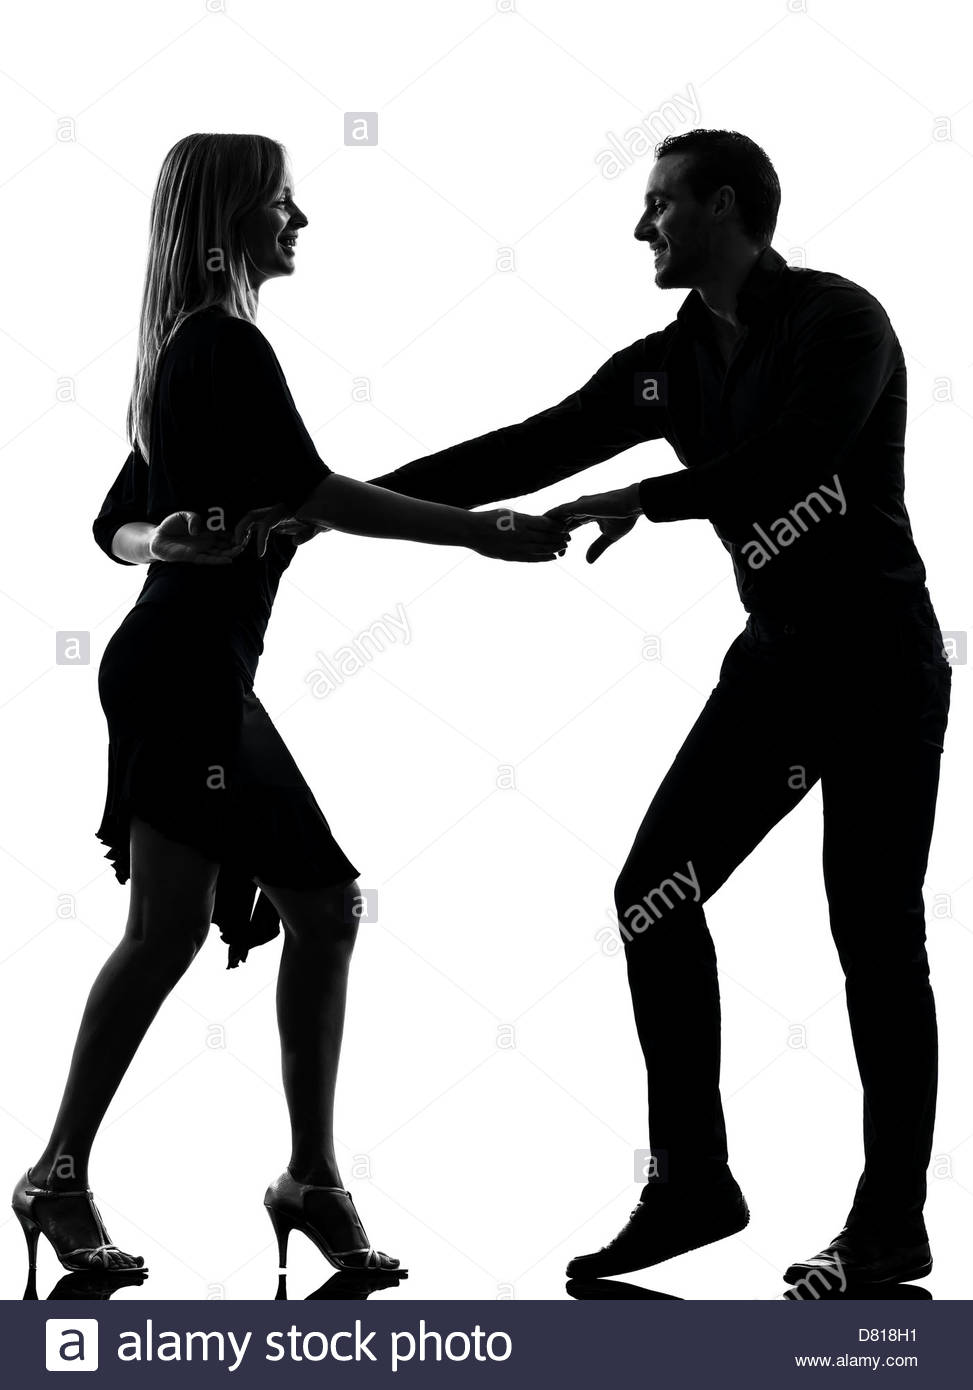 973x1390 One Couple Woman Man Dancing Dancers Salsa Rock In Silhouette